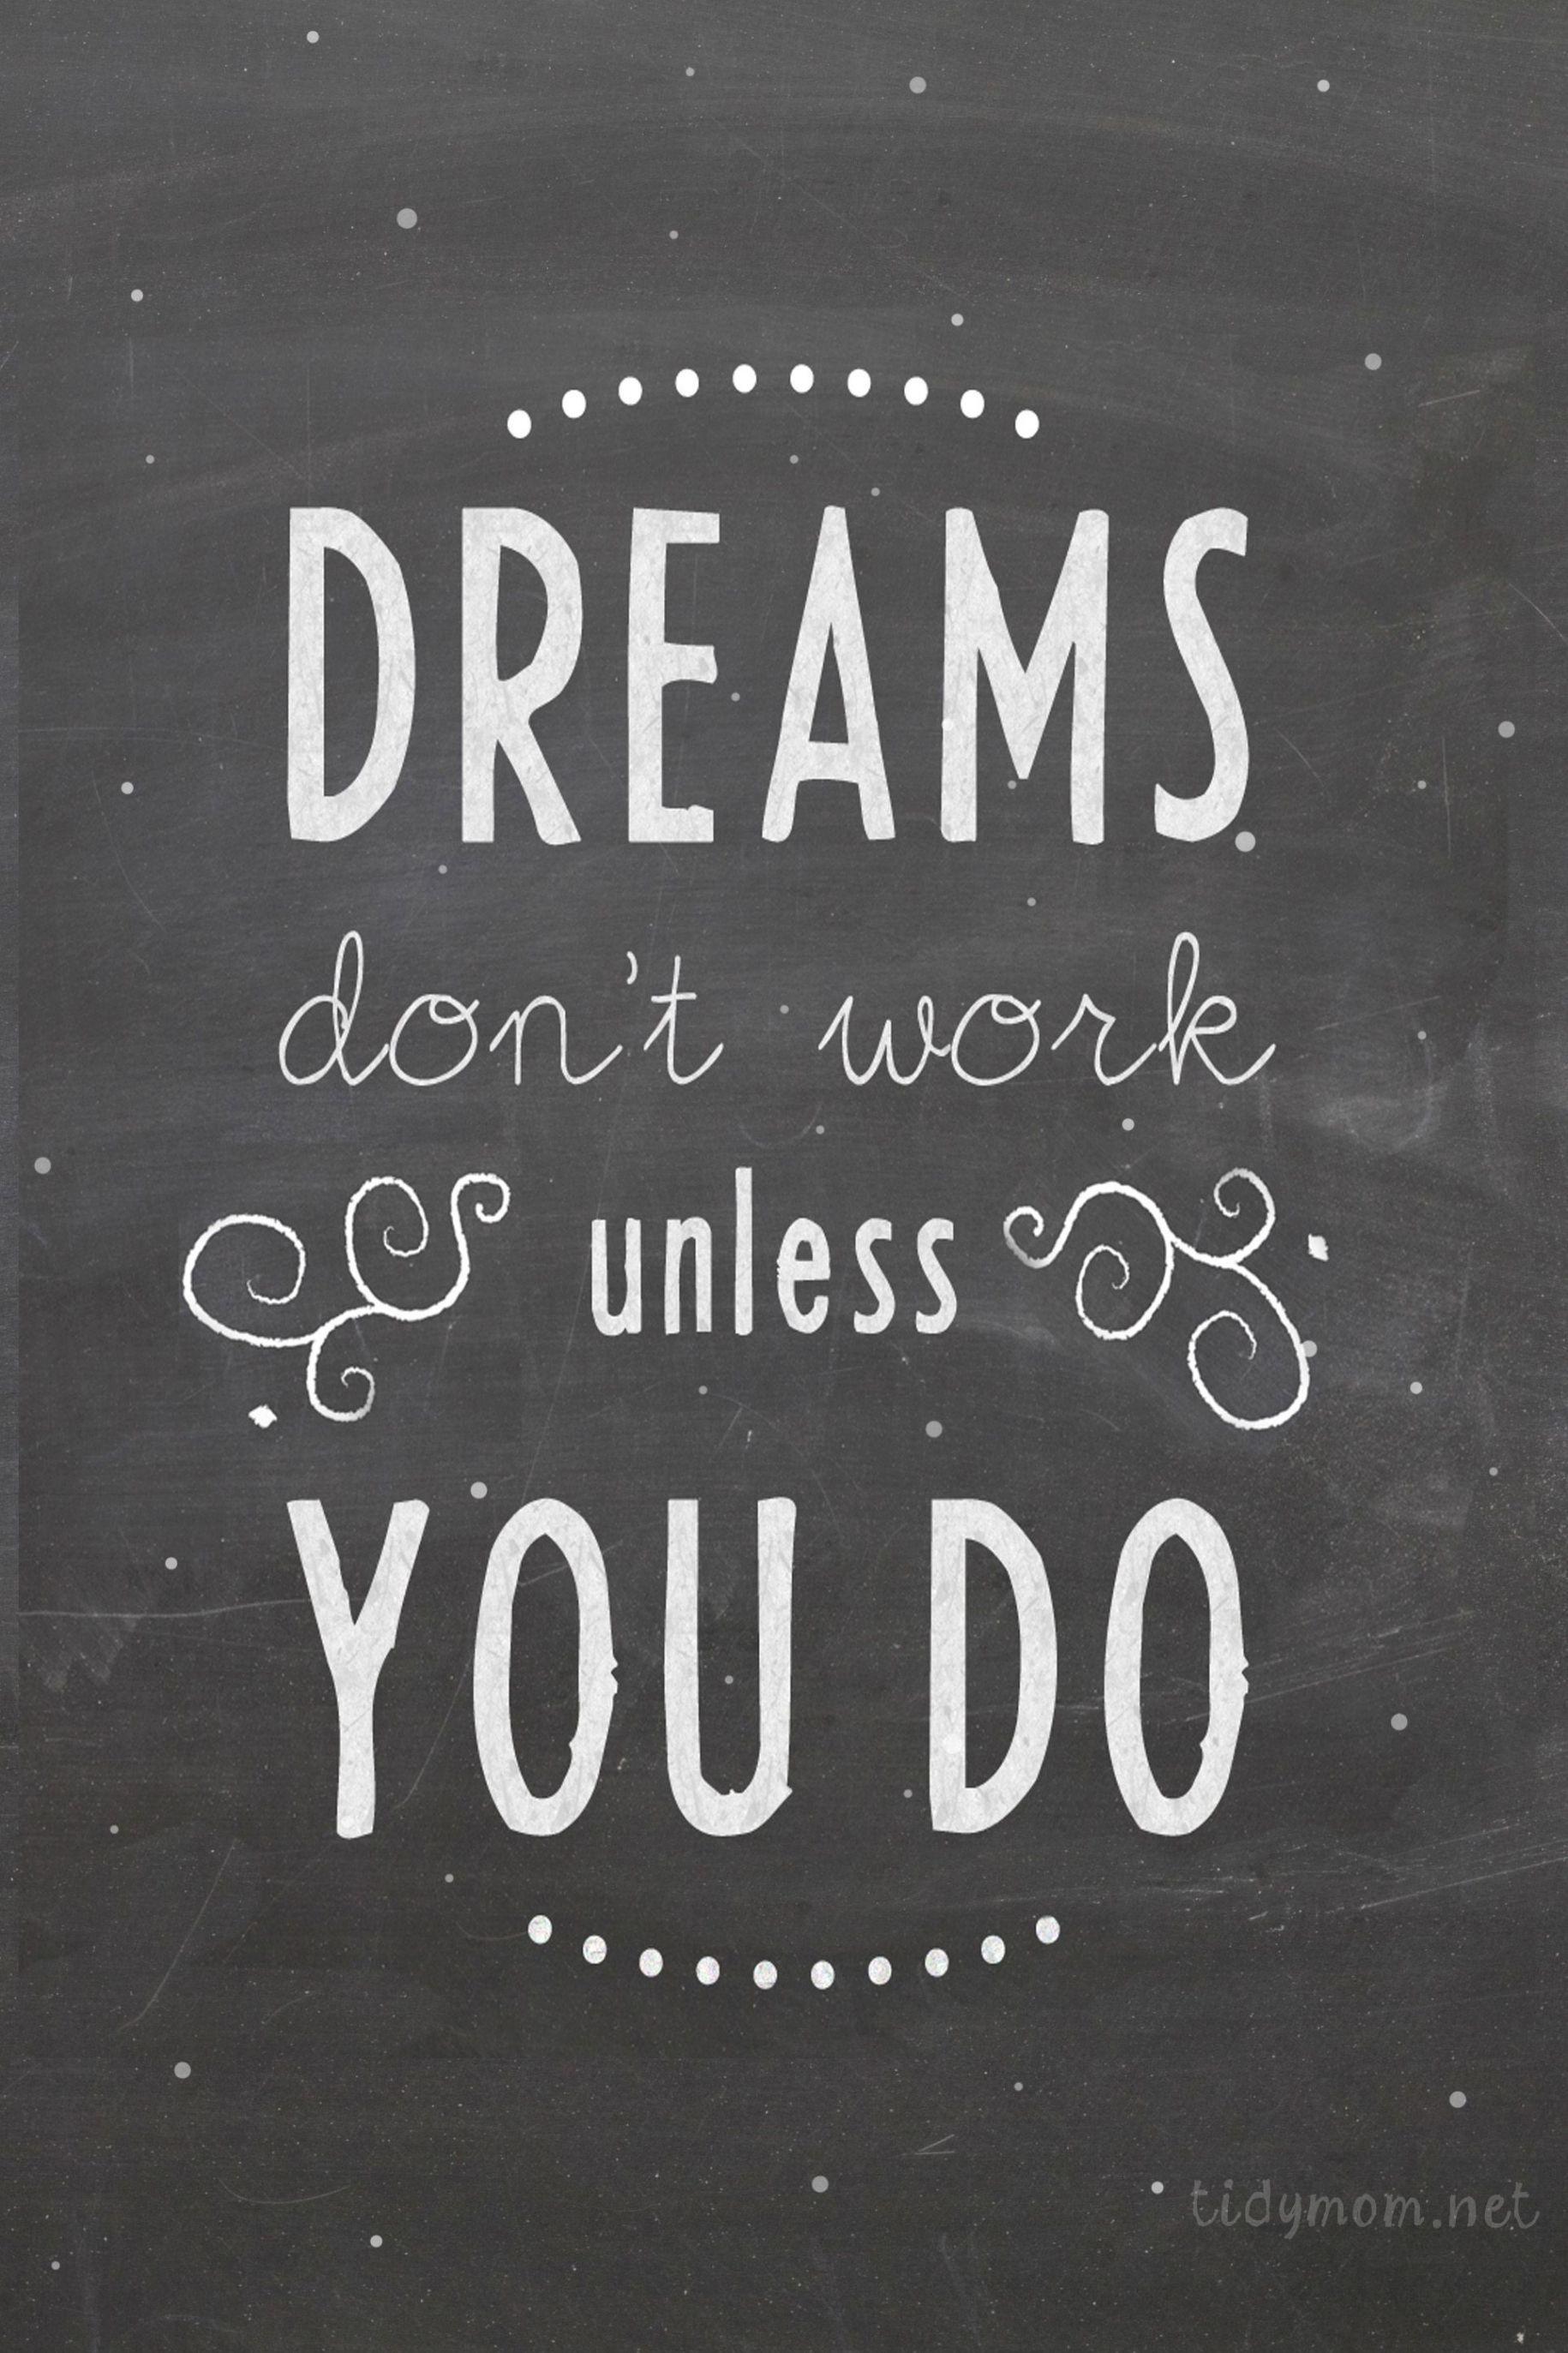 Iphone wallpaper tumblr quote